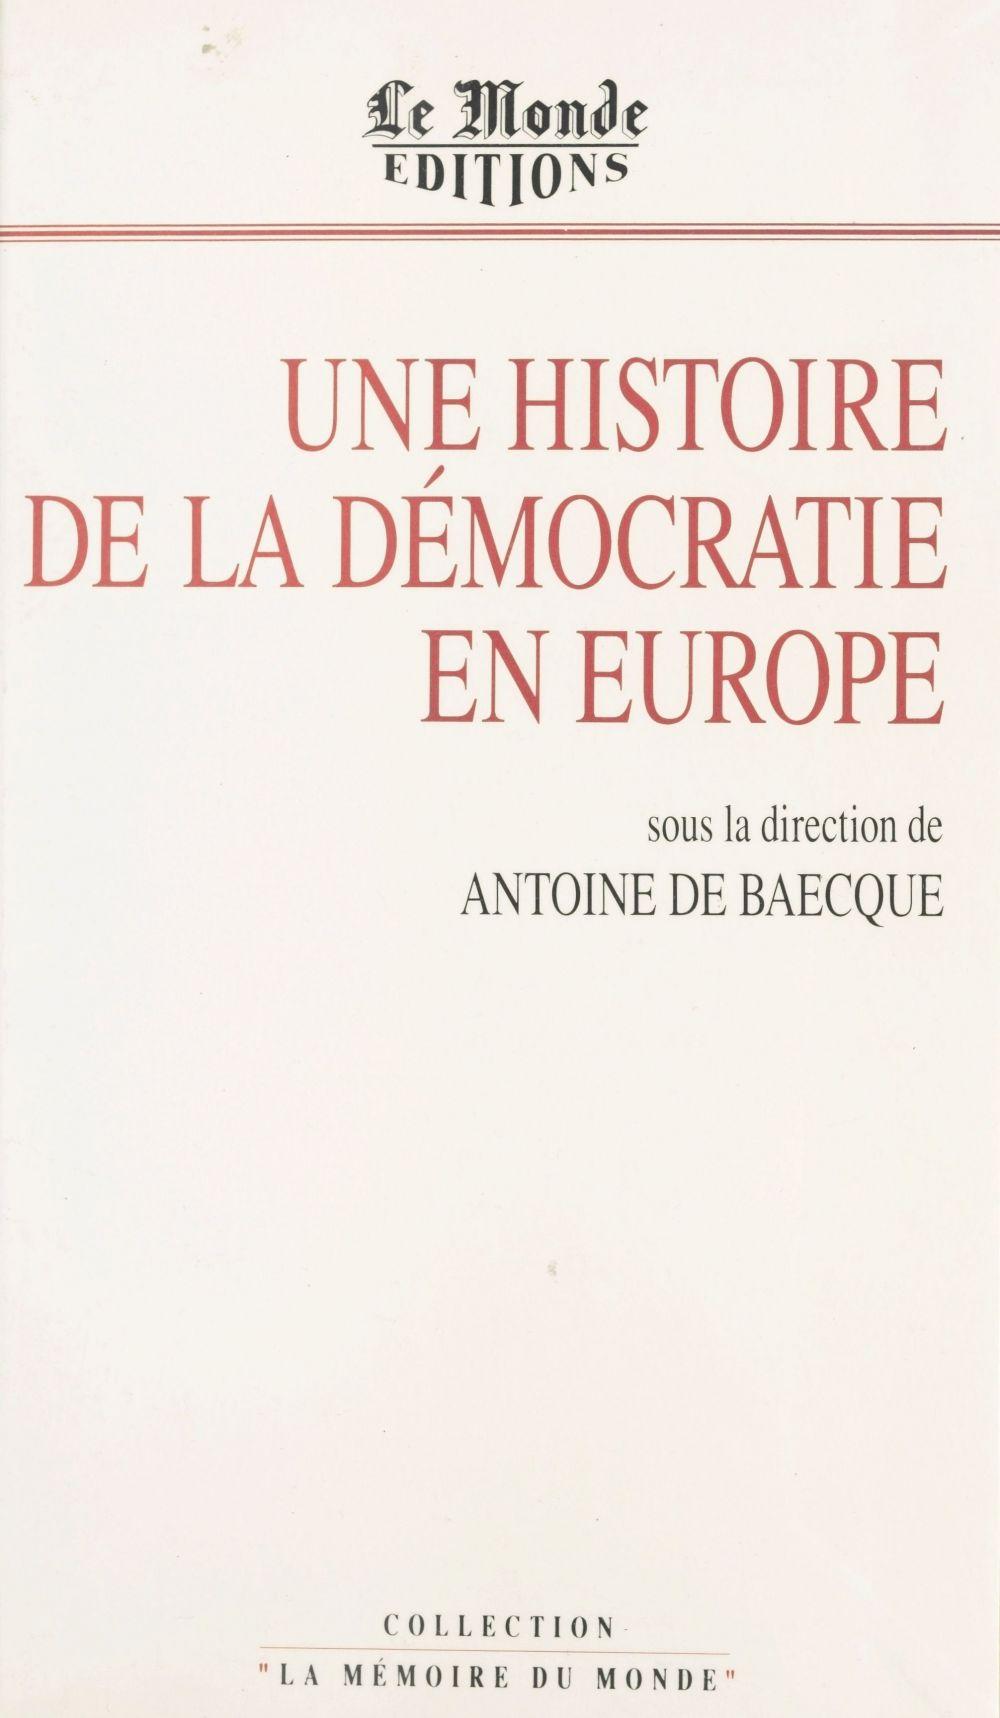 Une histoire de la democratie en europe